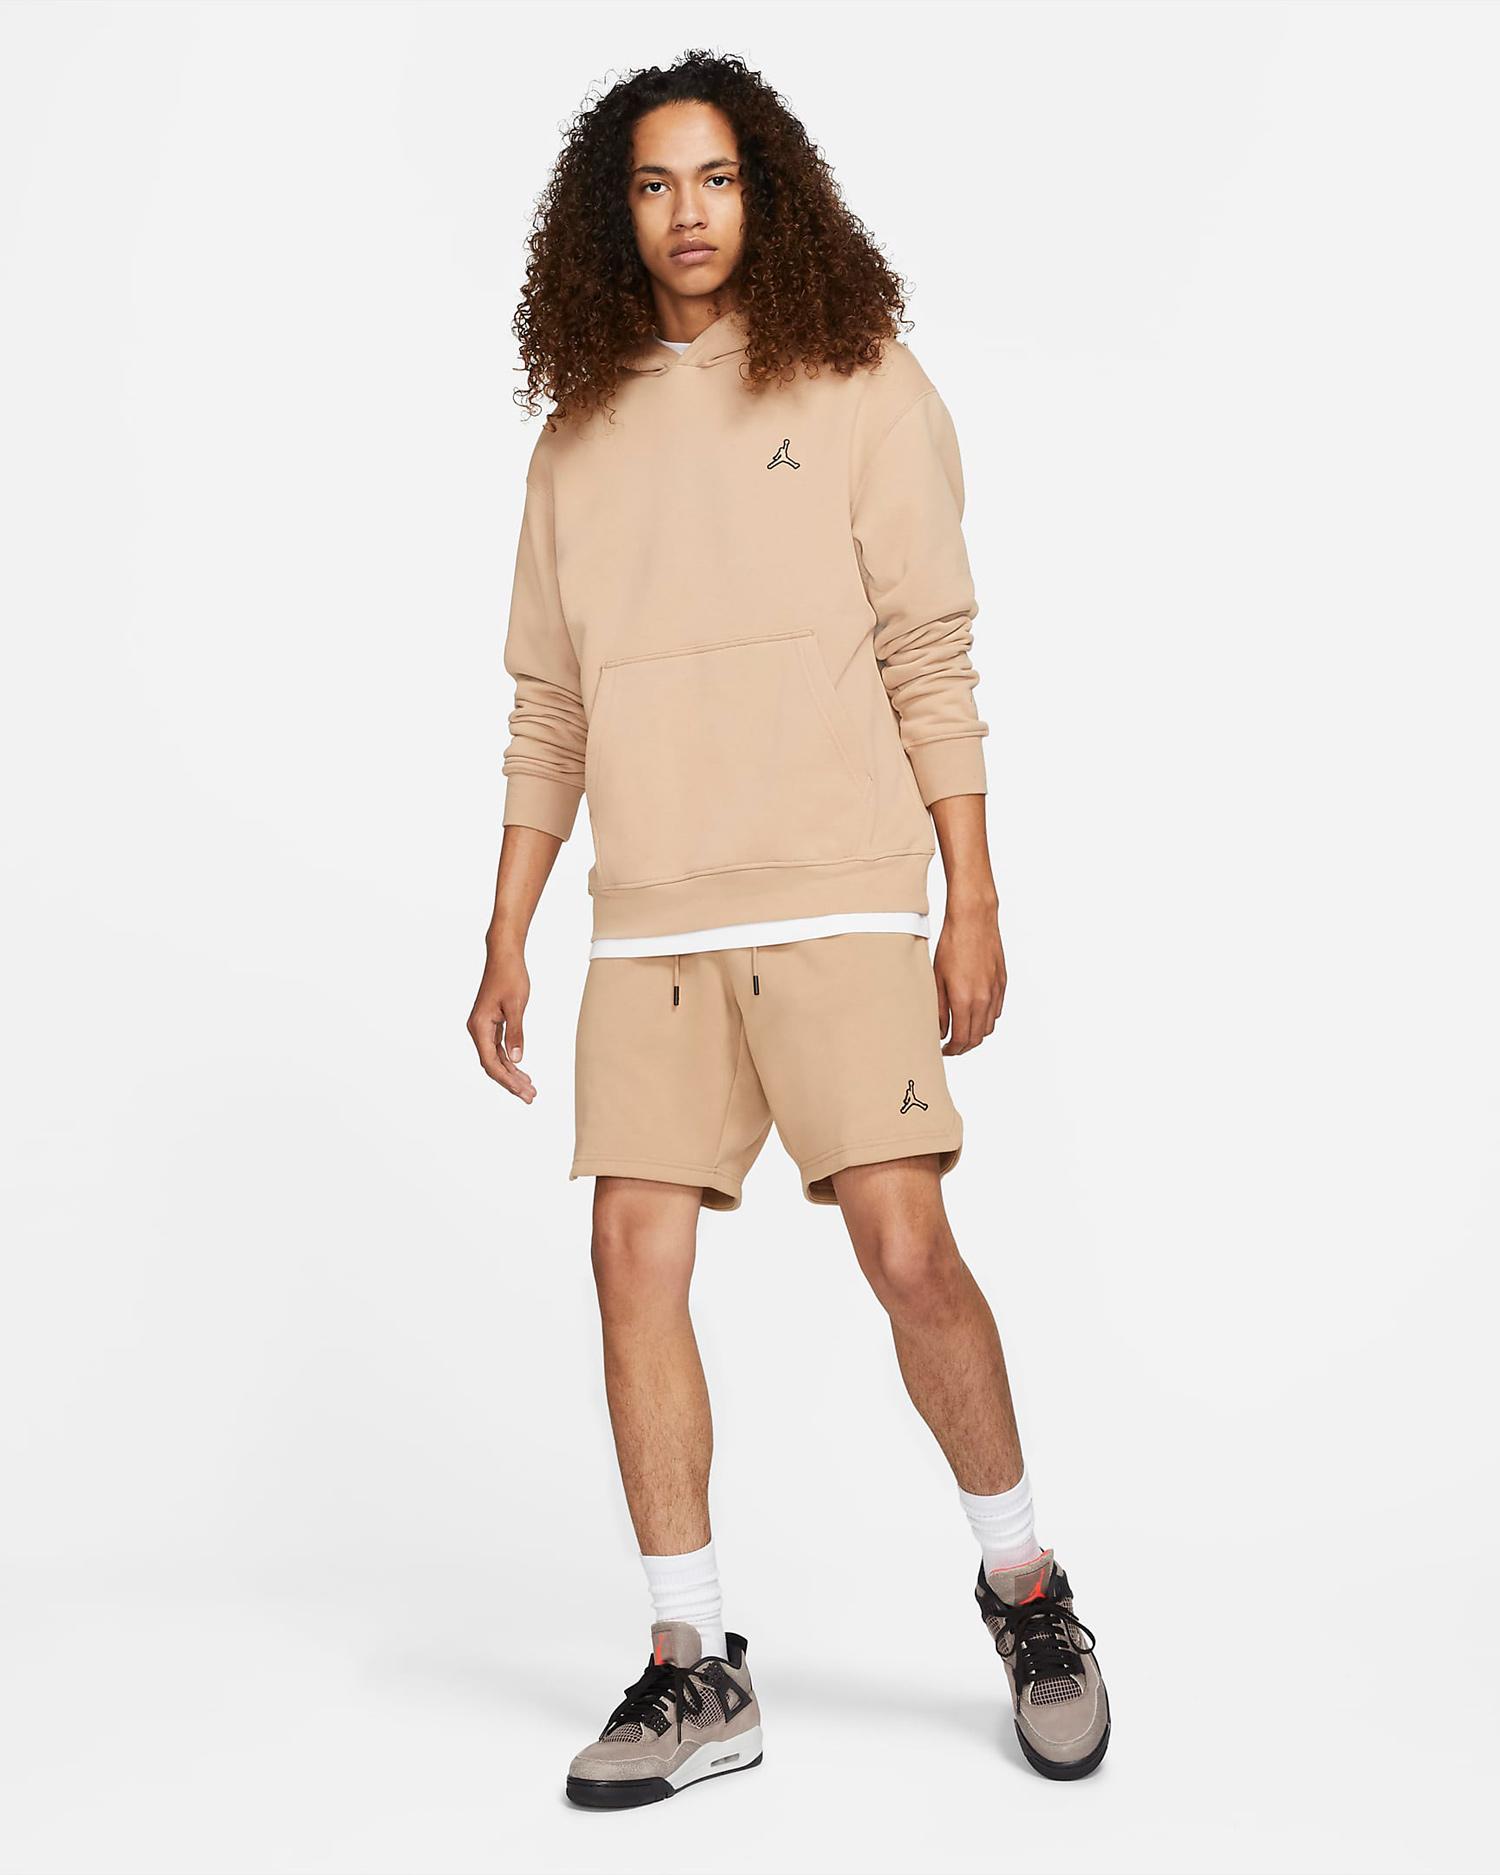 jordan-hemp-hoodie-shorts-outfit